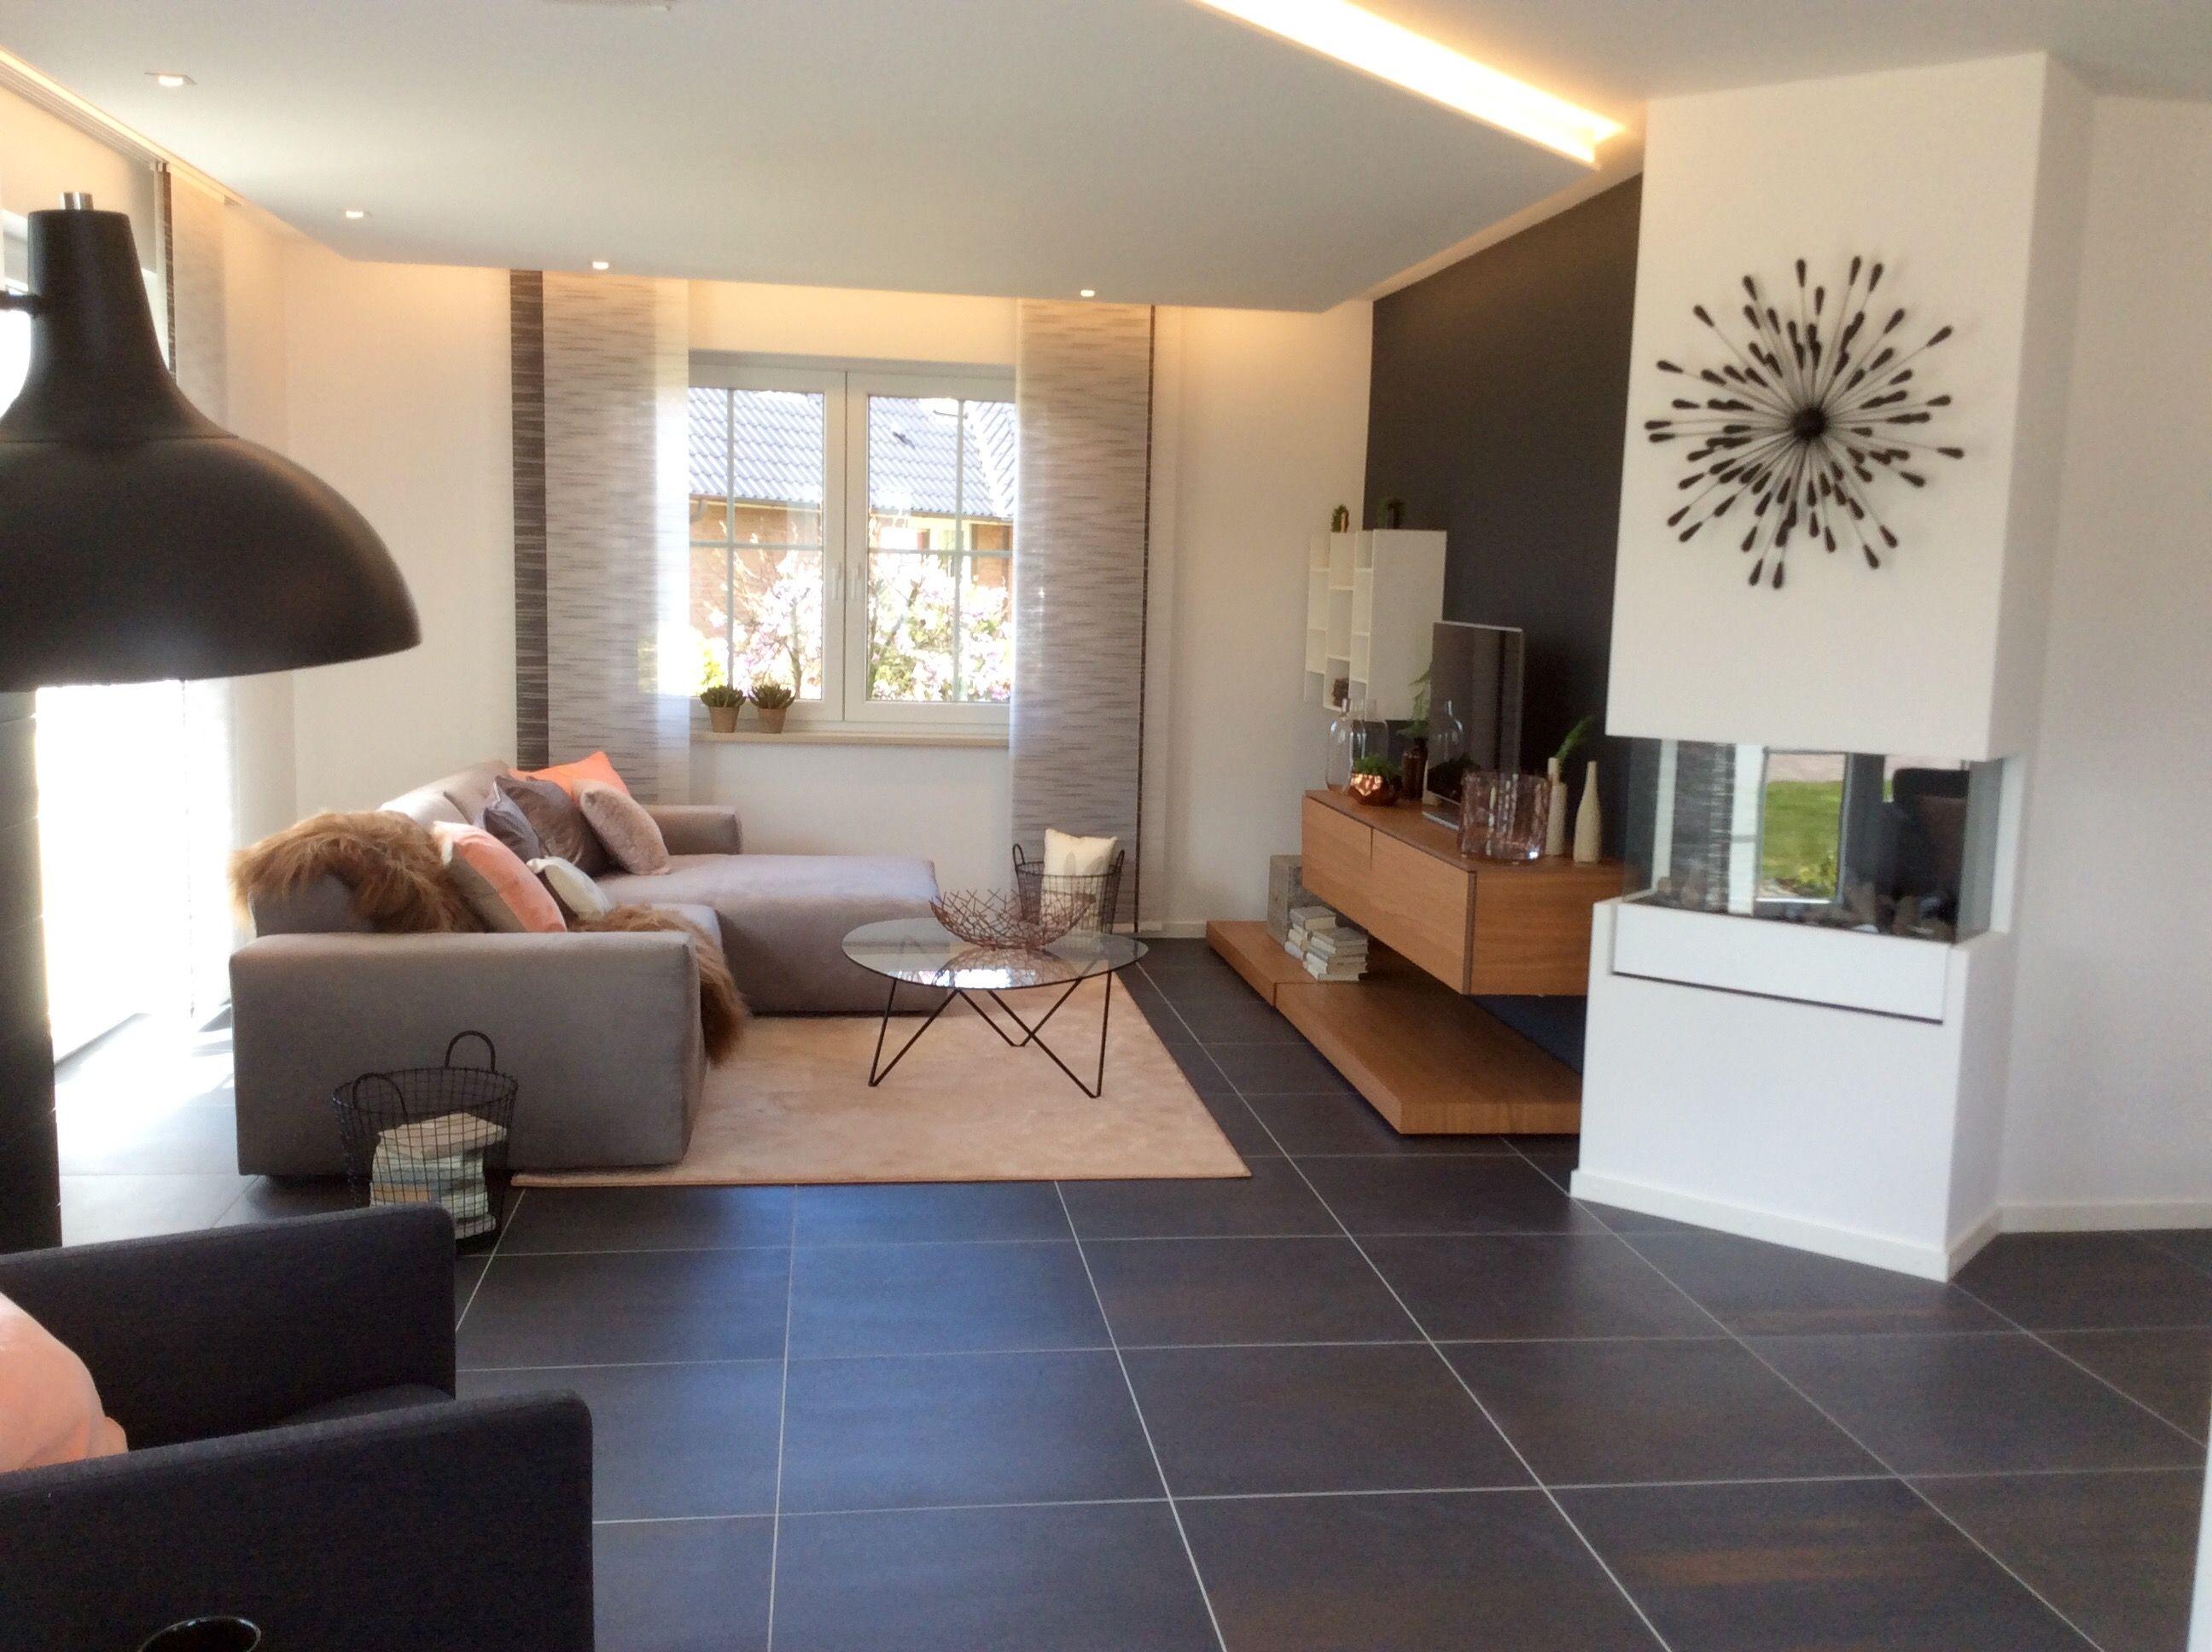 Holzaufbewahrung Wohnzimmer ~ 21 best viebrock e 455 kaarst images on pinterest bedroom and homes